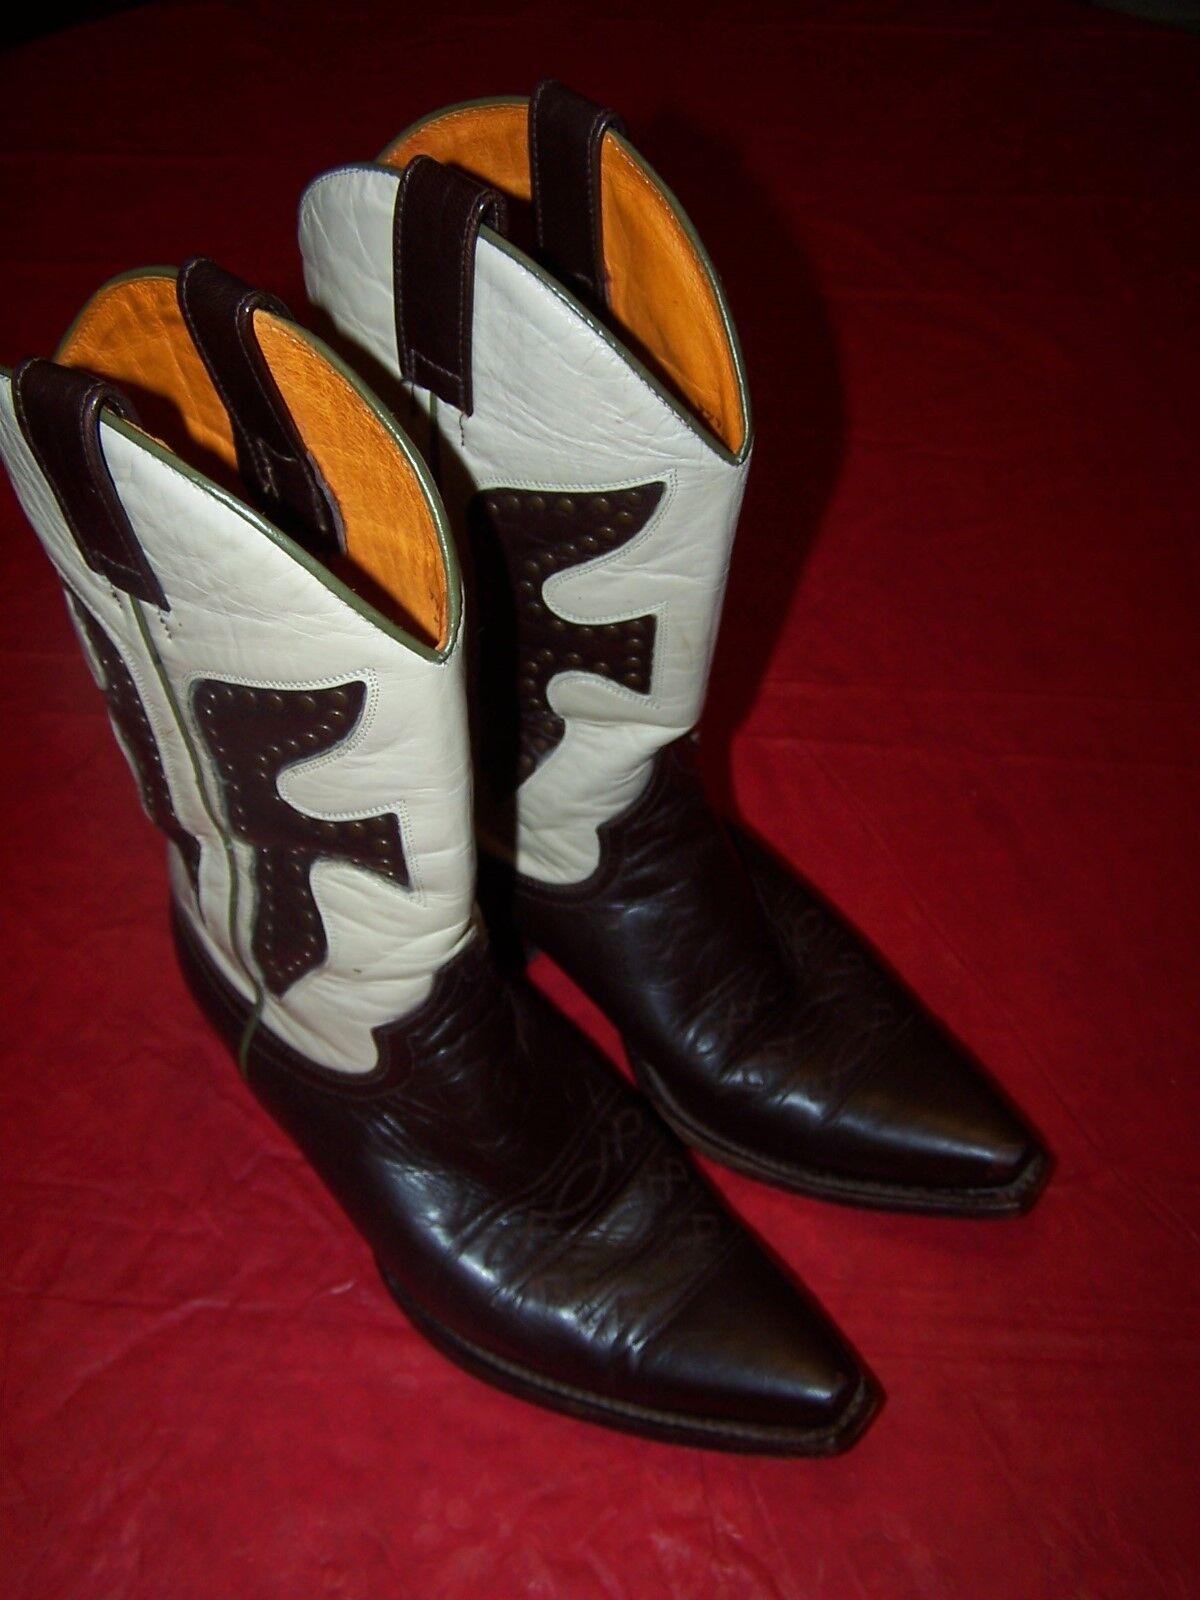 Frye Daisy Daisy Daisy Duke botas de vaquero   77780 Oscuro Chocolate Crema 8.5M  Mejor precio